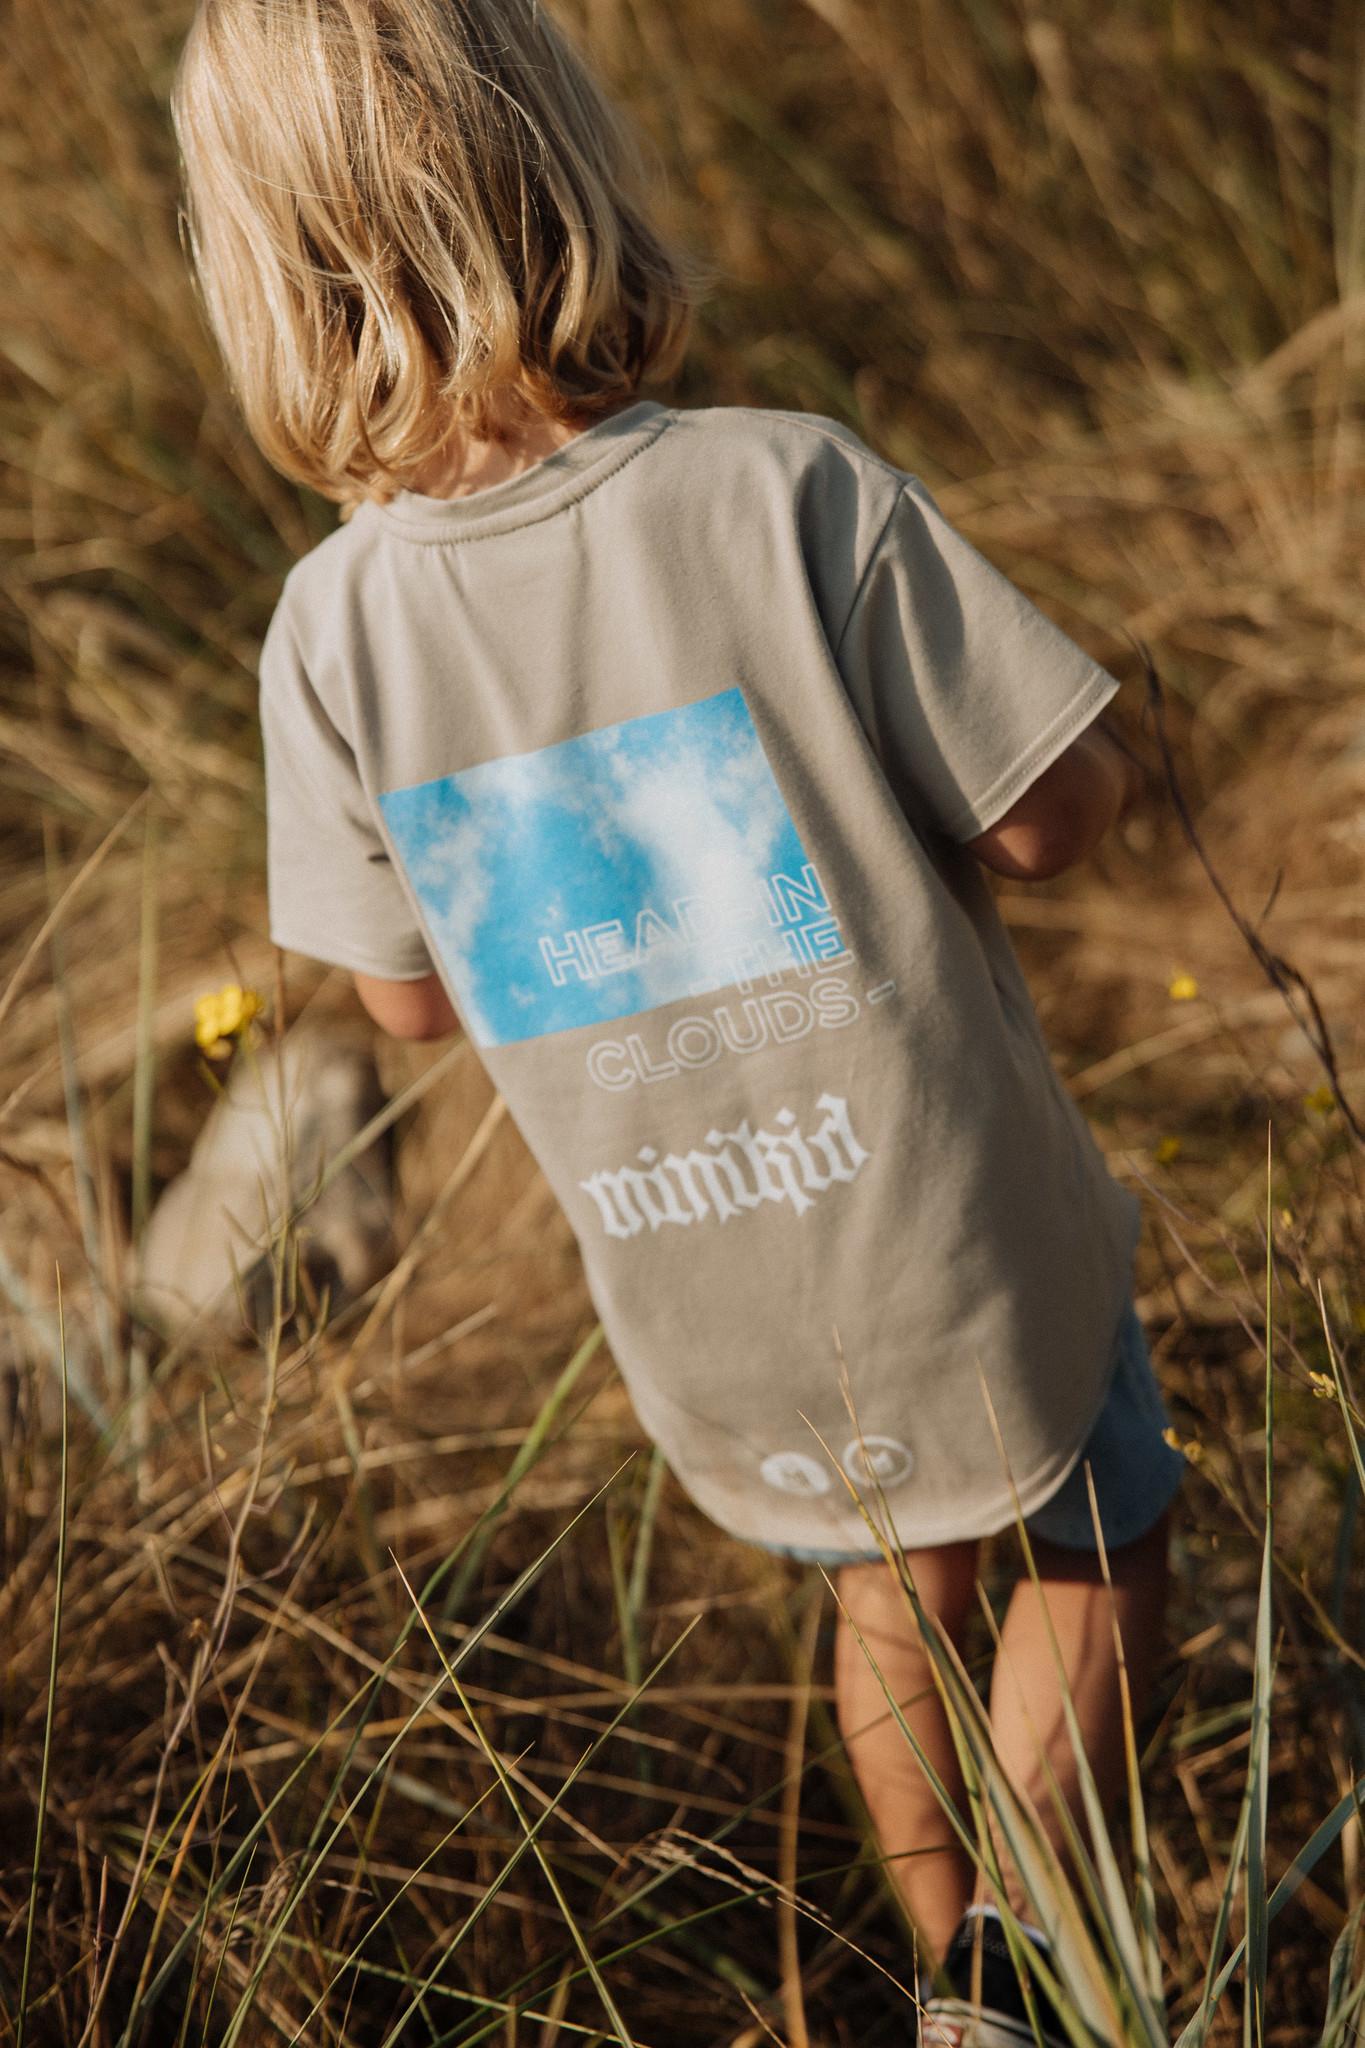 Minikid COOL BOYS T-SHIRT | STREETSTYLE CHILDREN'S CLOTHING | MINIKID